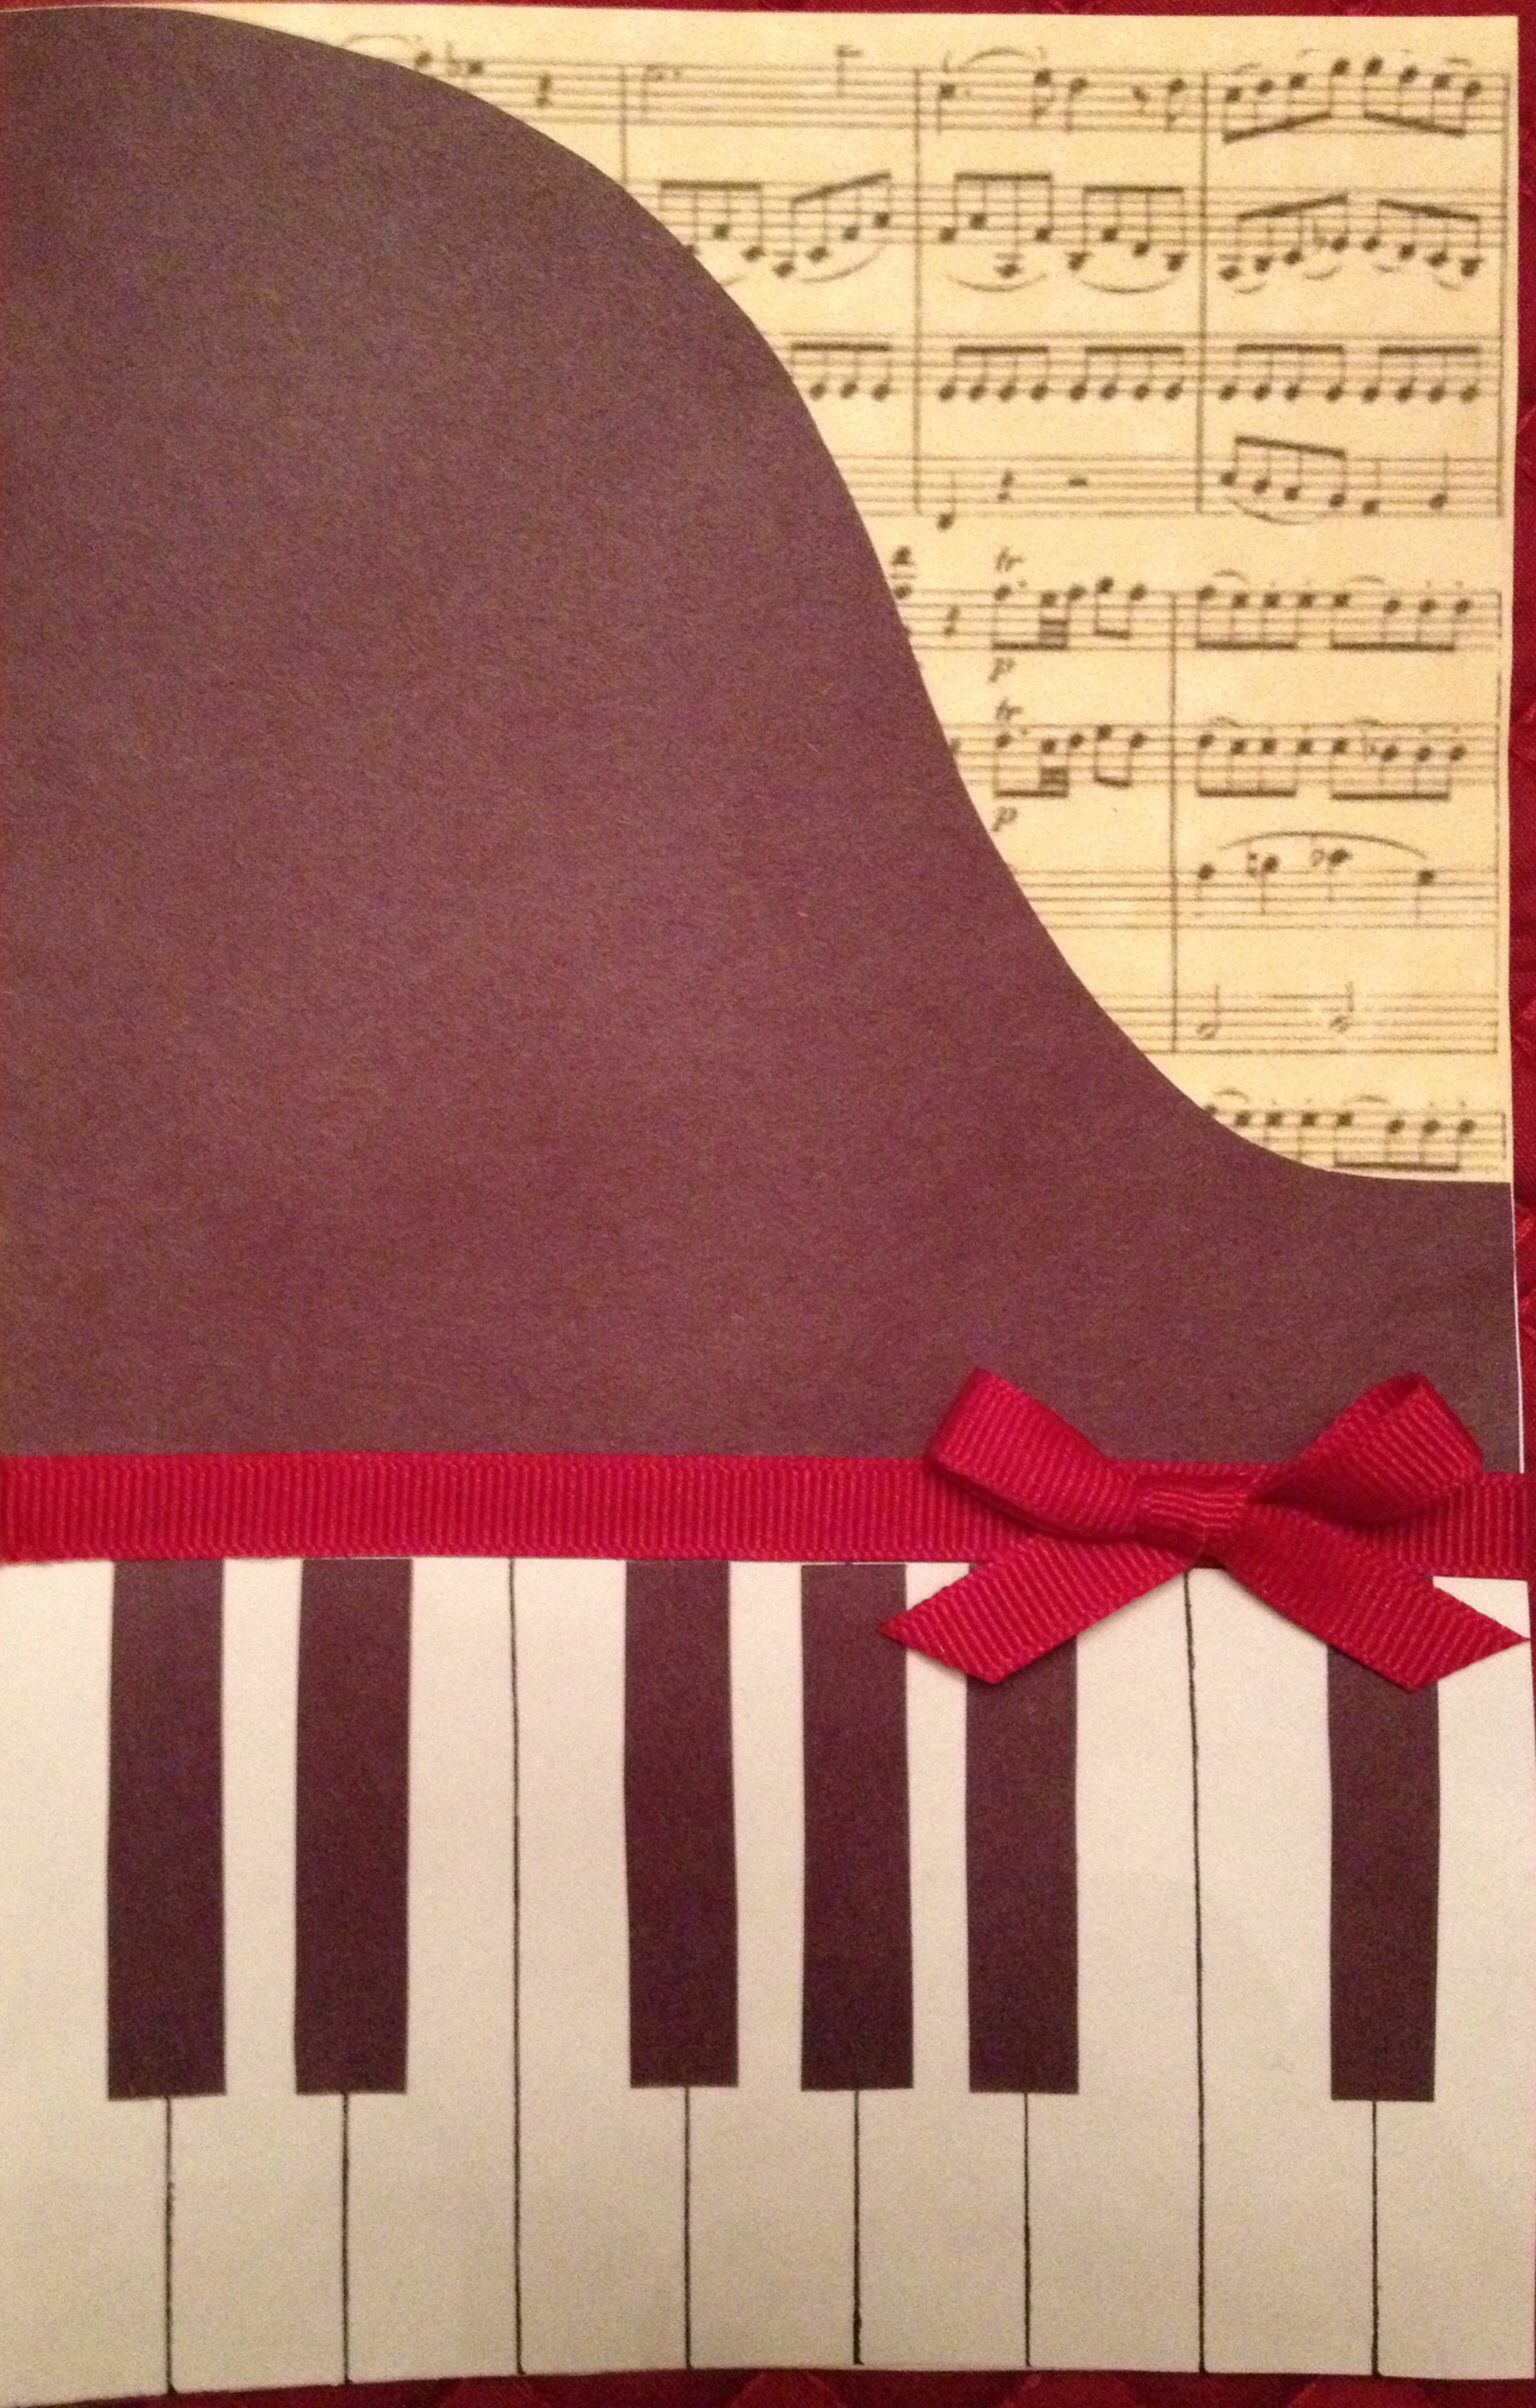 Birthday friendship thank you card blank music note